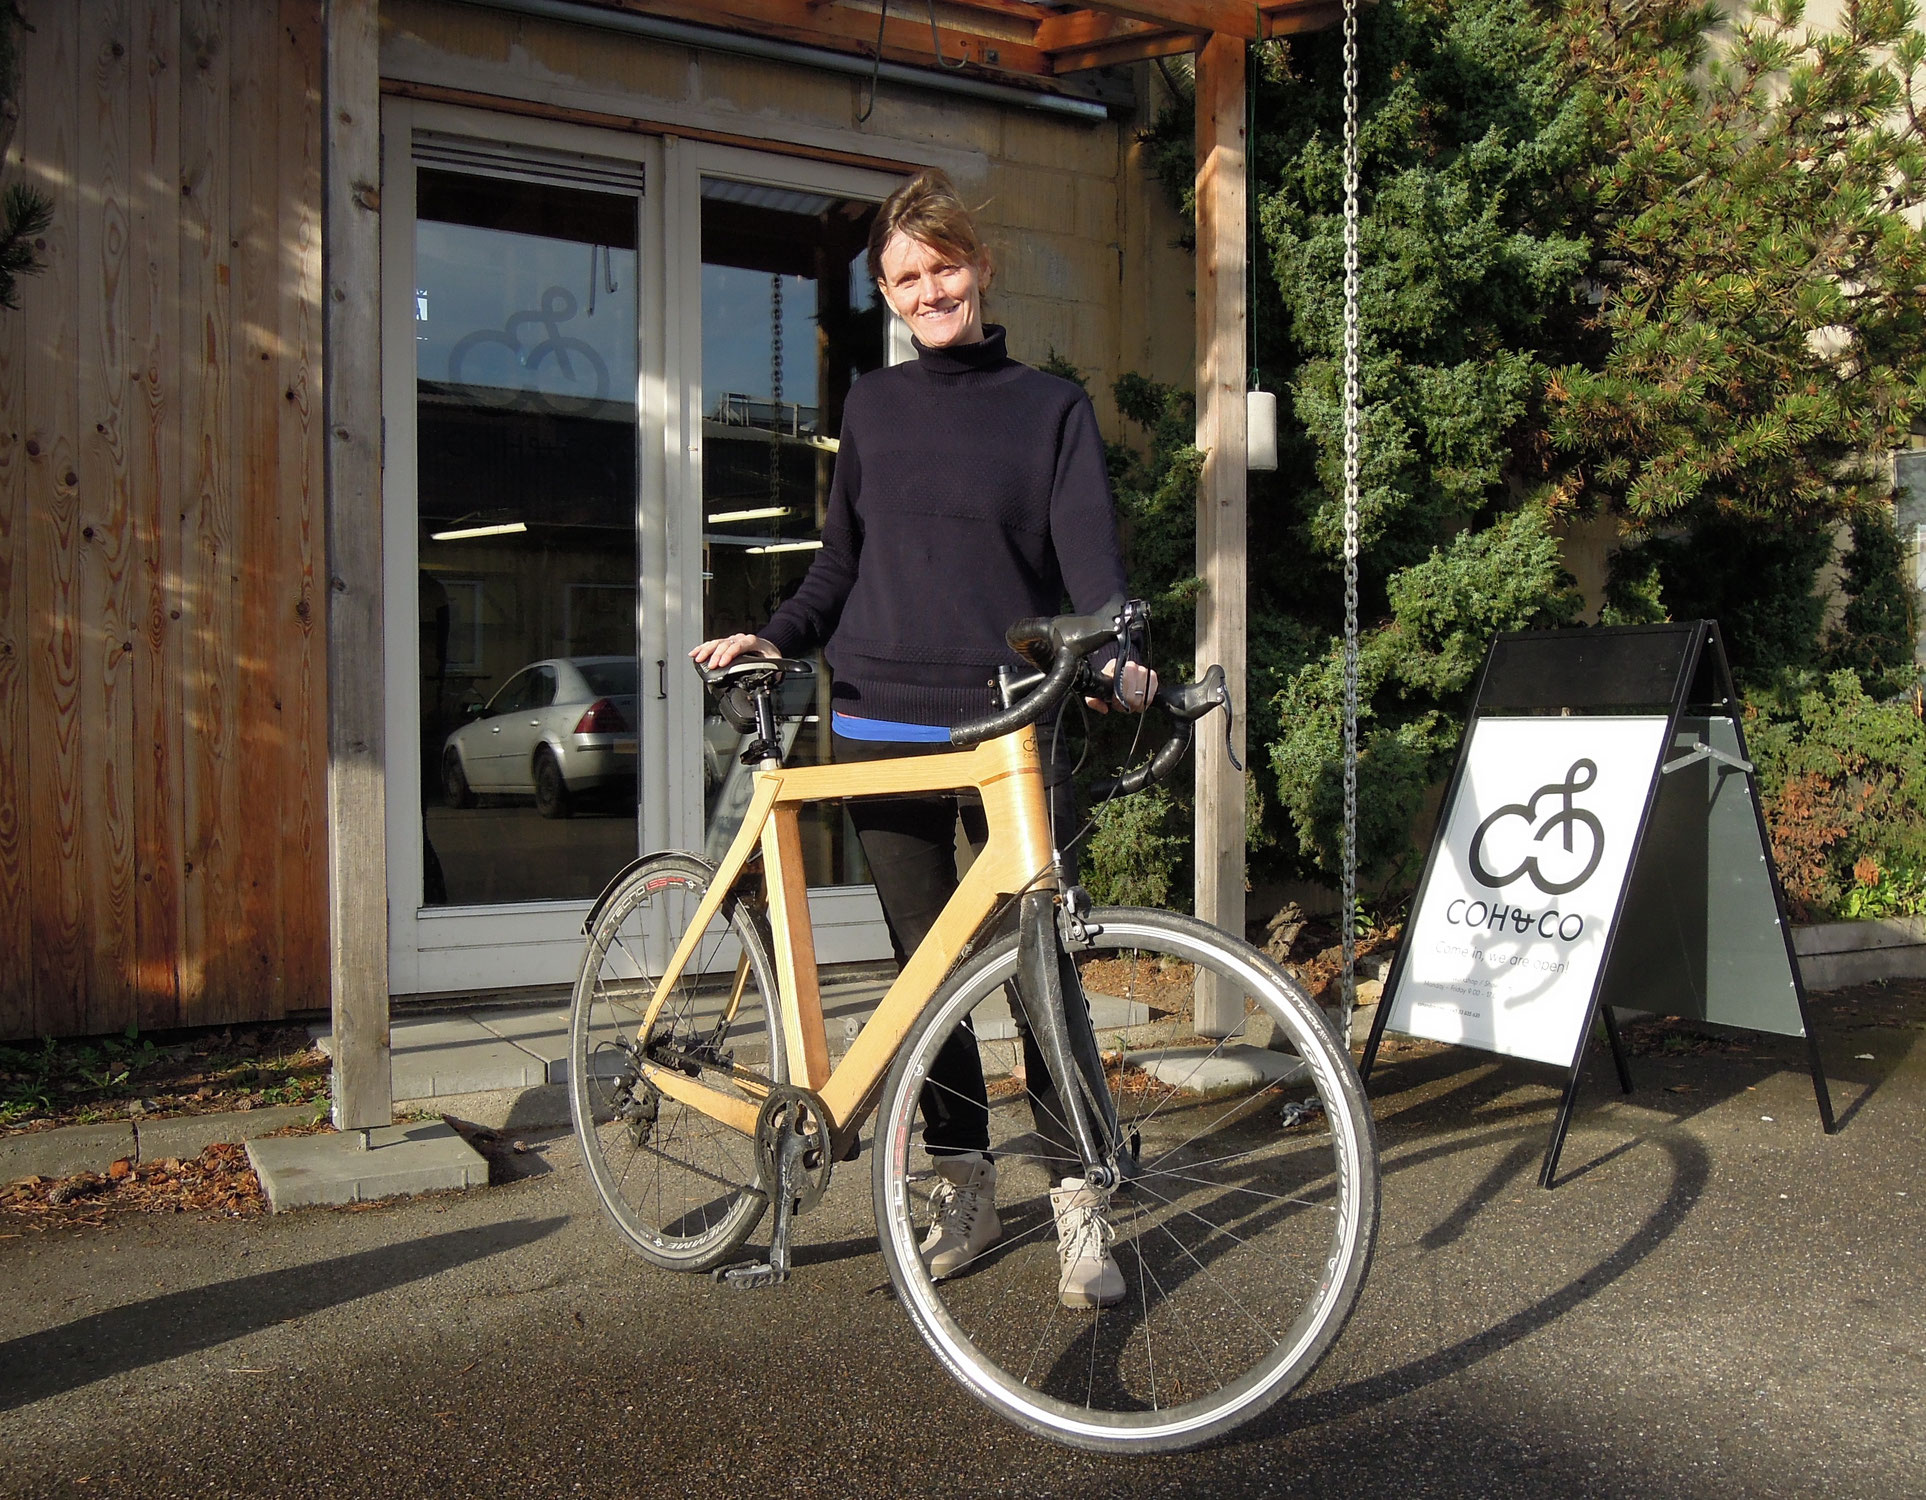 Der Rahmen zum Bikerglück –die Kopenhagener Fahrradmanufaktur Coh&Co